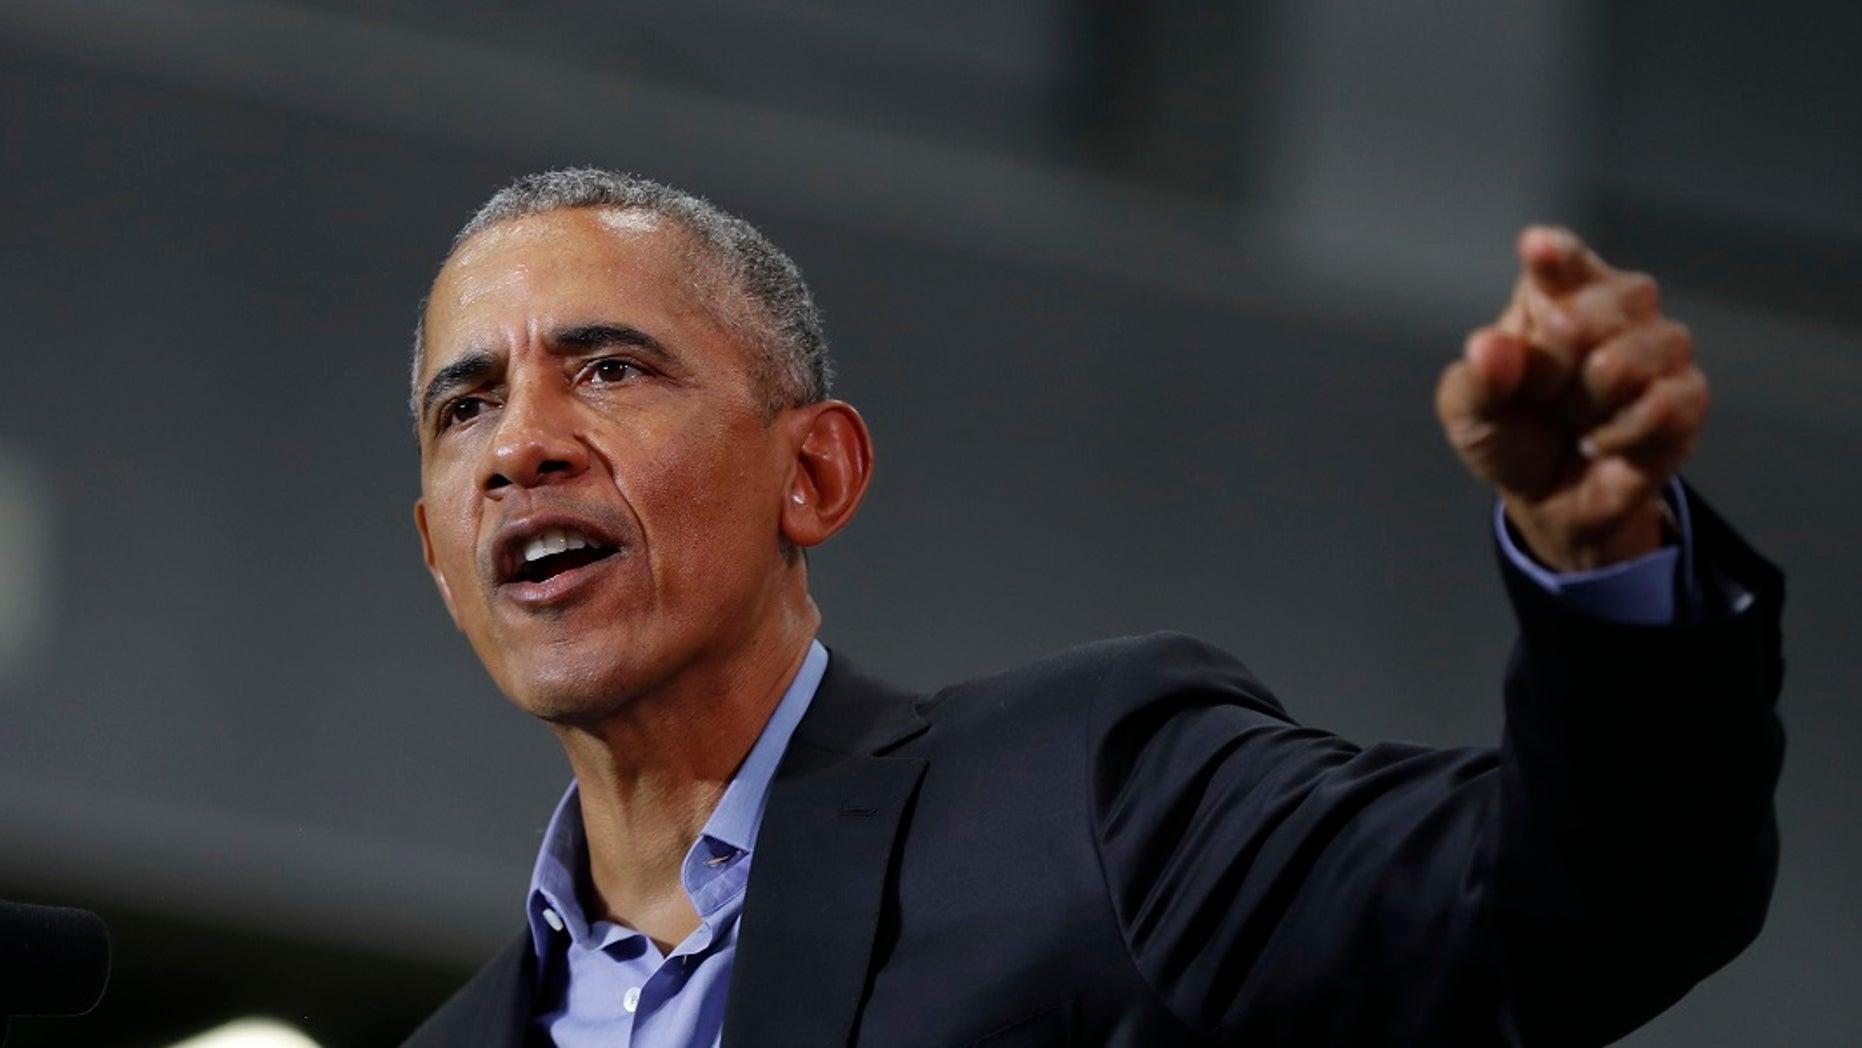 Former President Barack Obama speaks during a rally in Detroit on Friday.